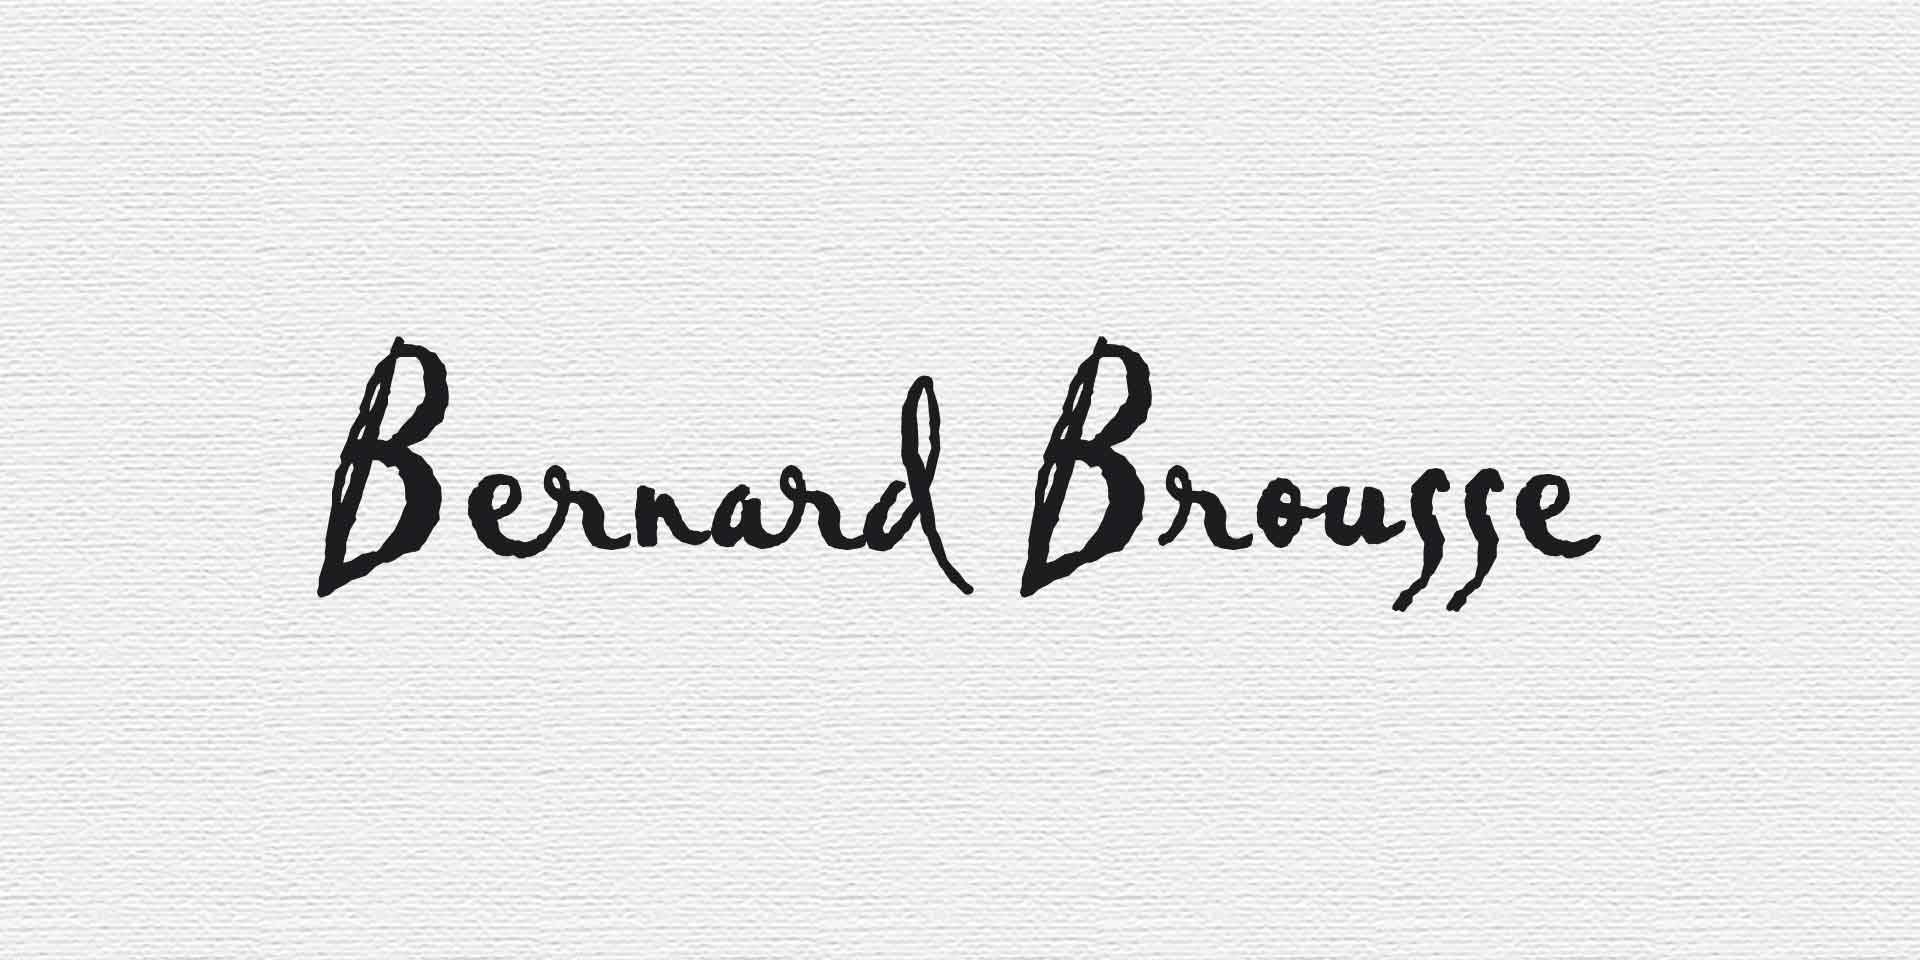 Bernard Brousse